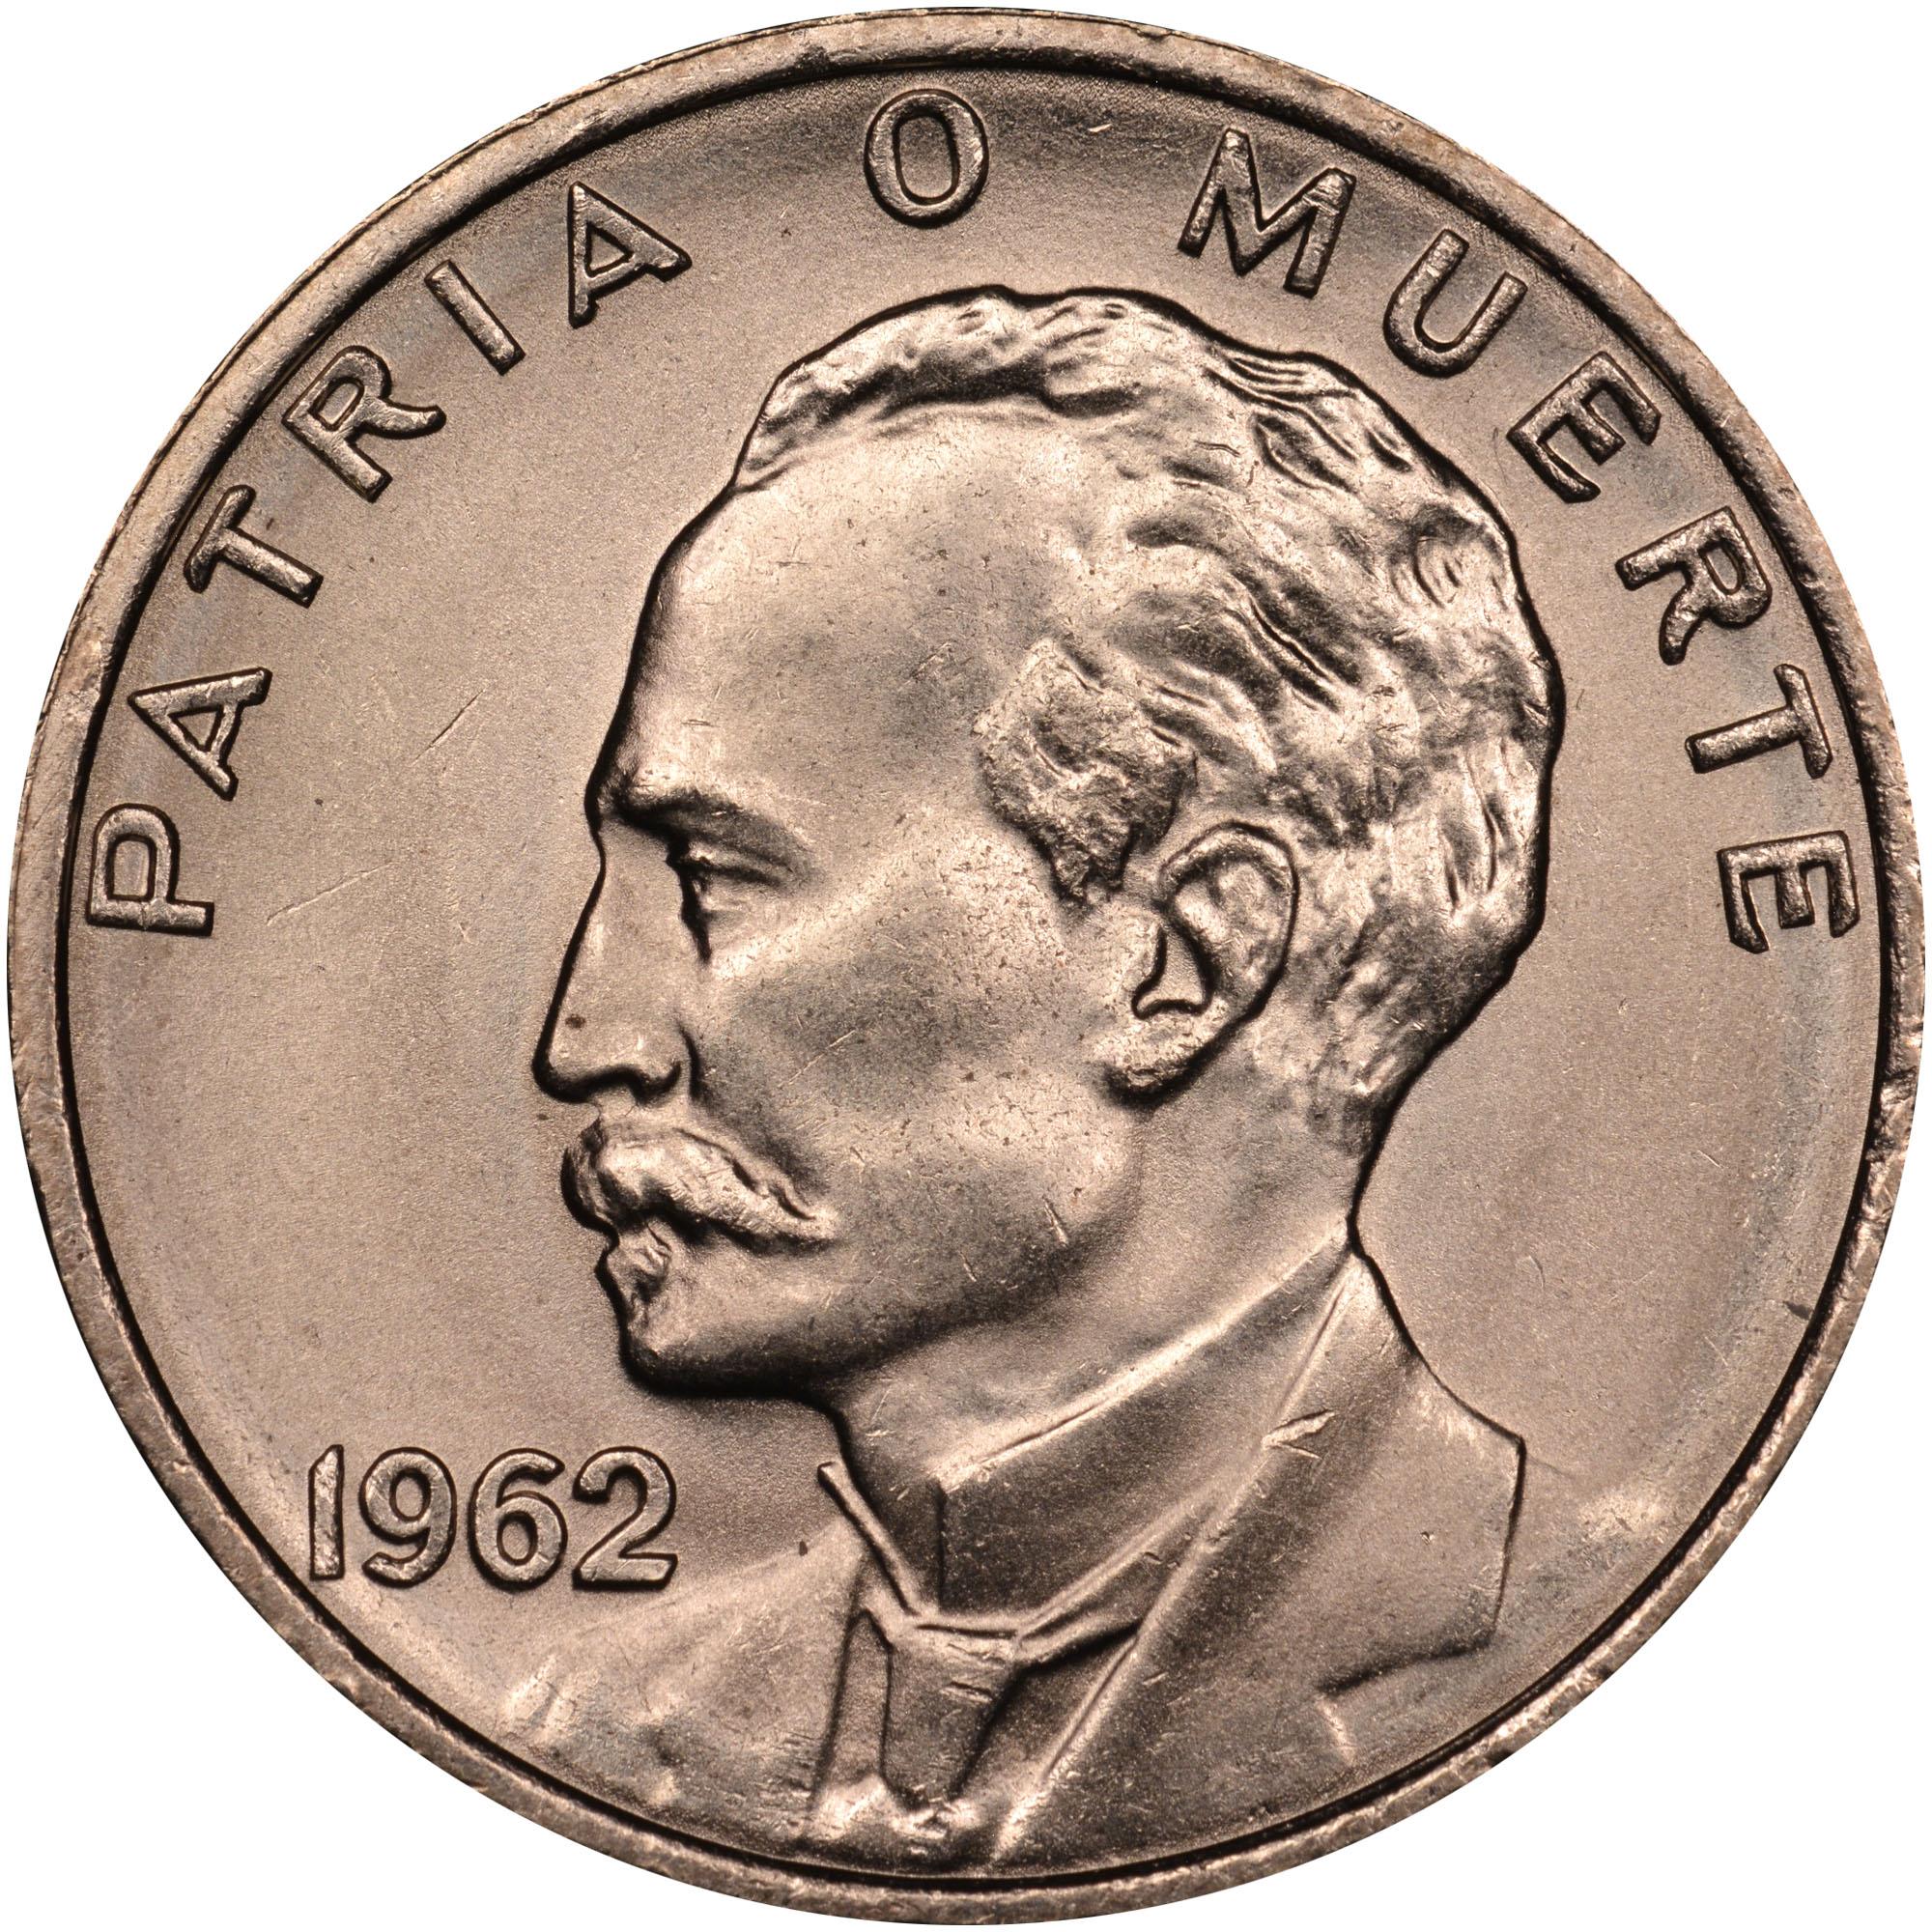 1962-1968 Cuba 20 Centavos reverse